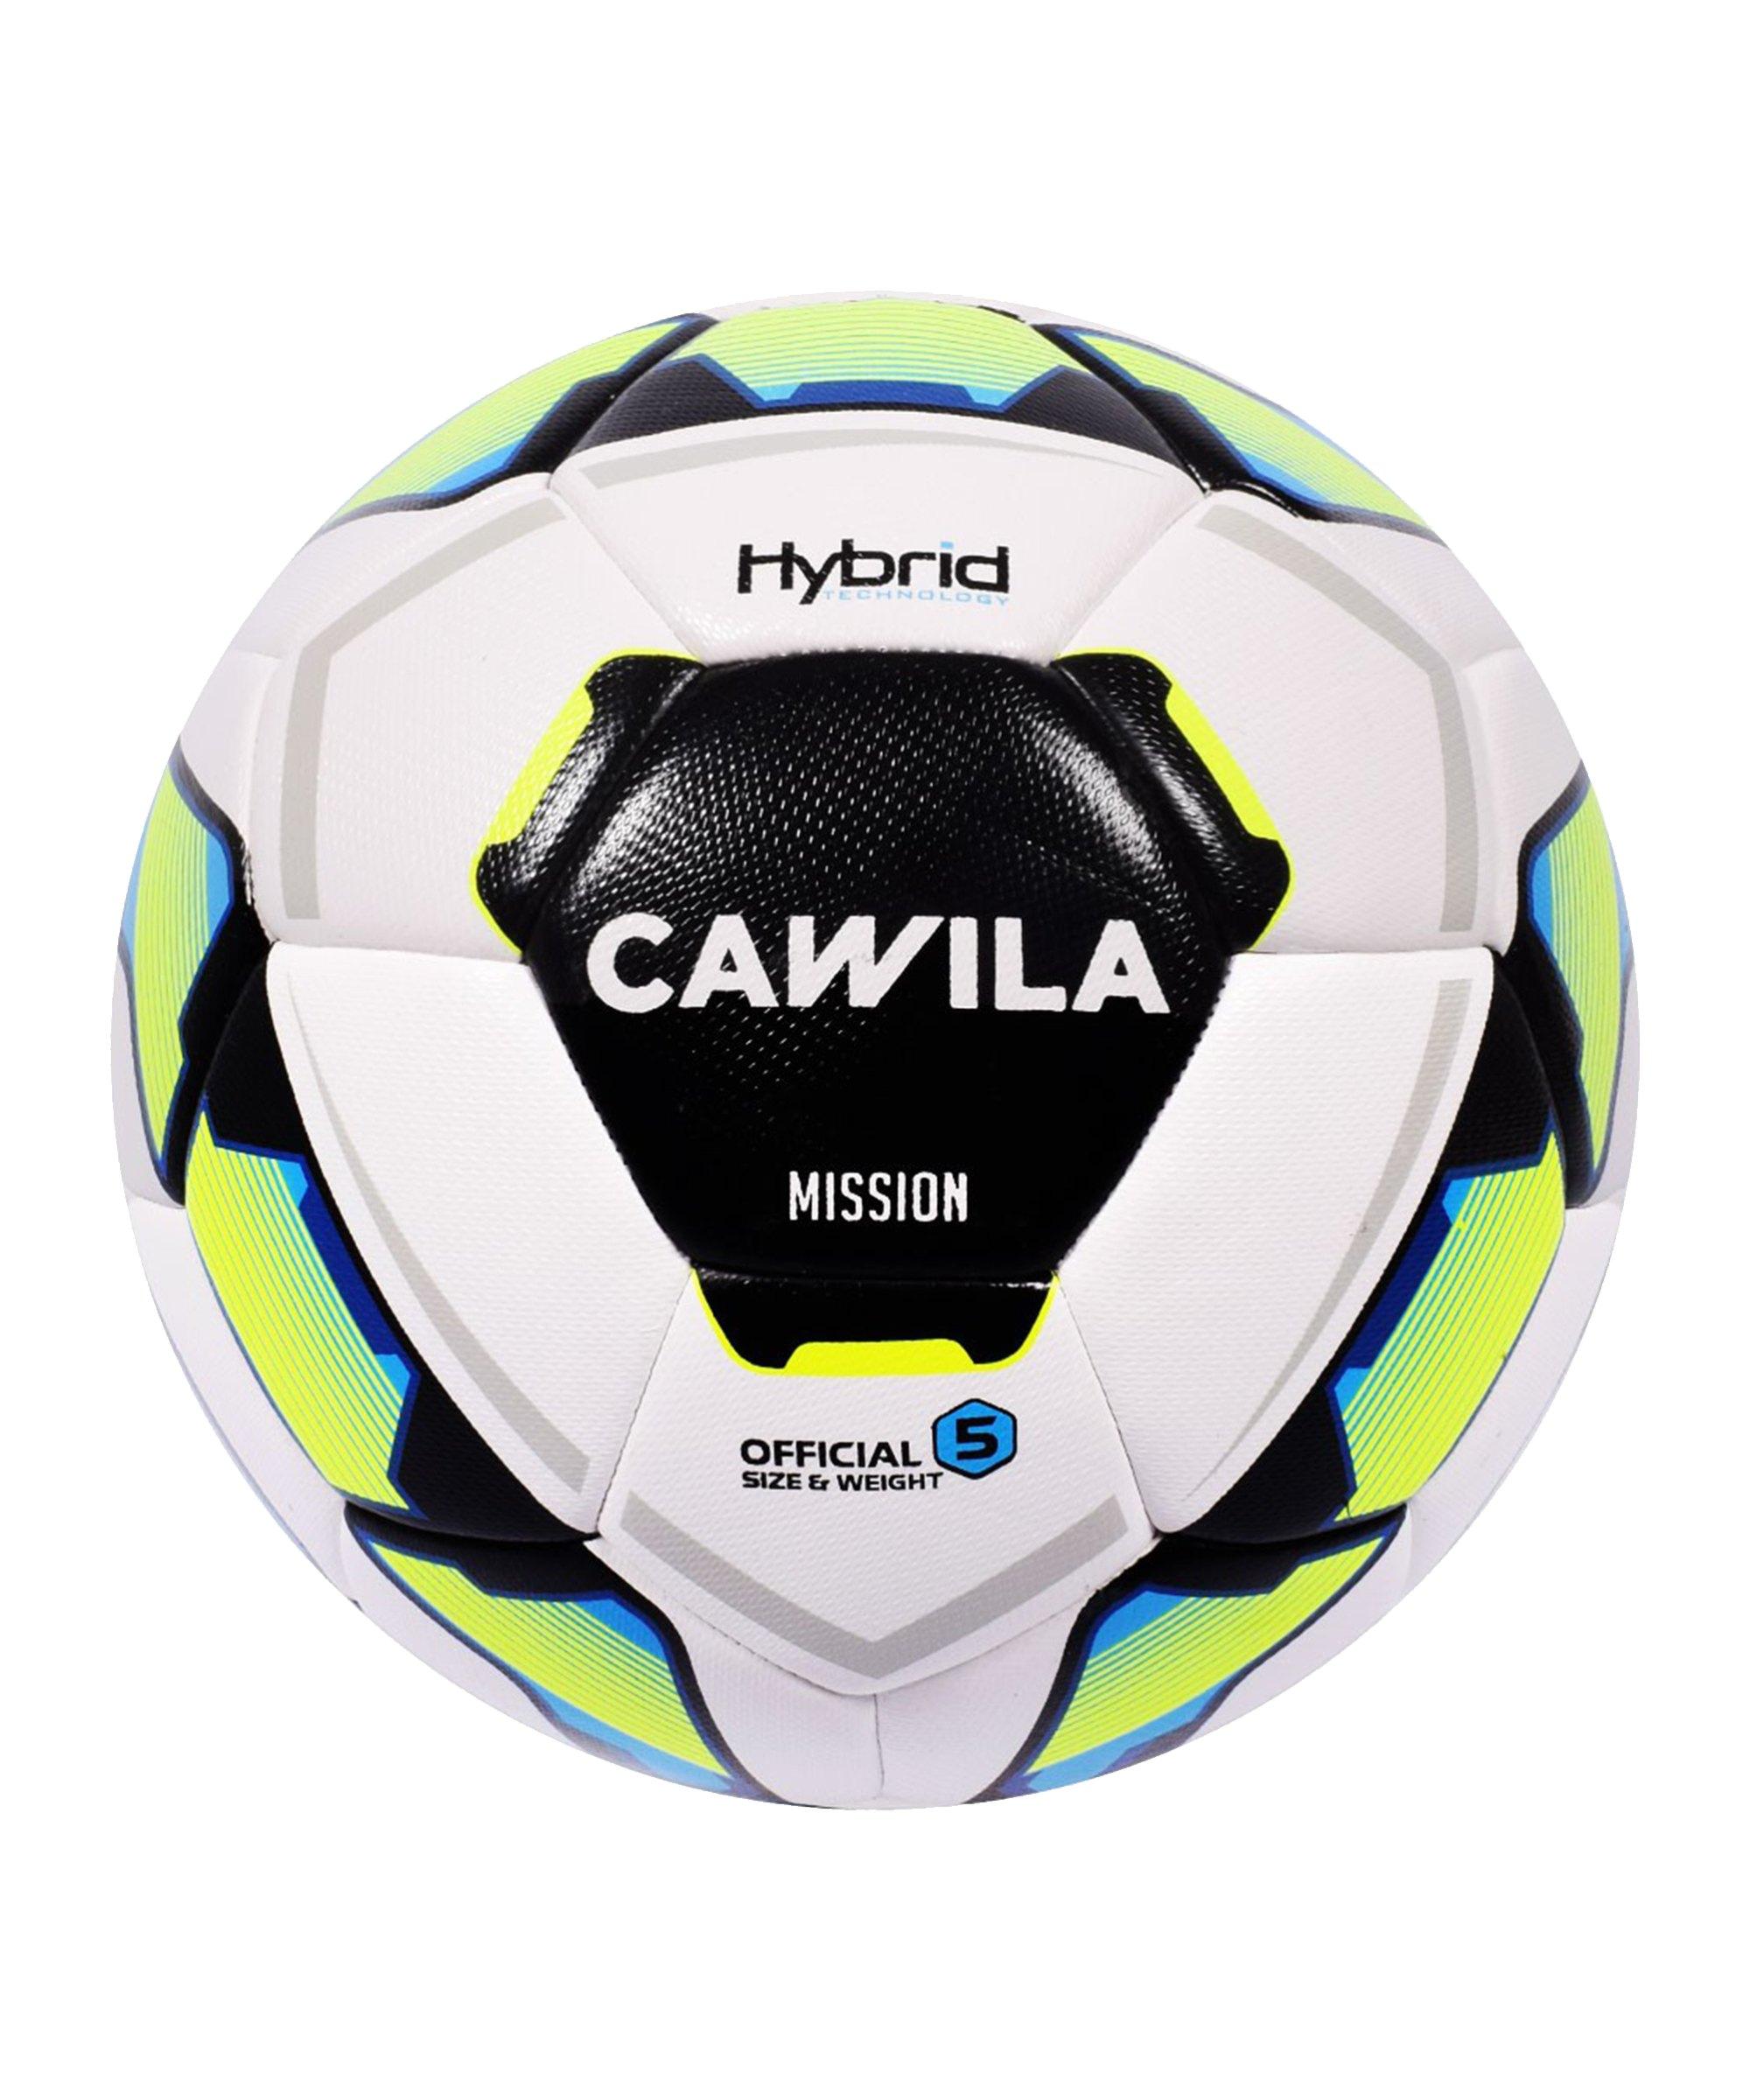 Cawila Fussball MISSION HYBRID X-LITE 290 290g 5 - weiss